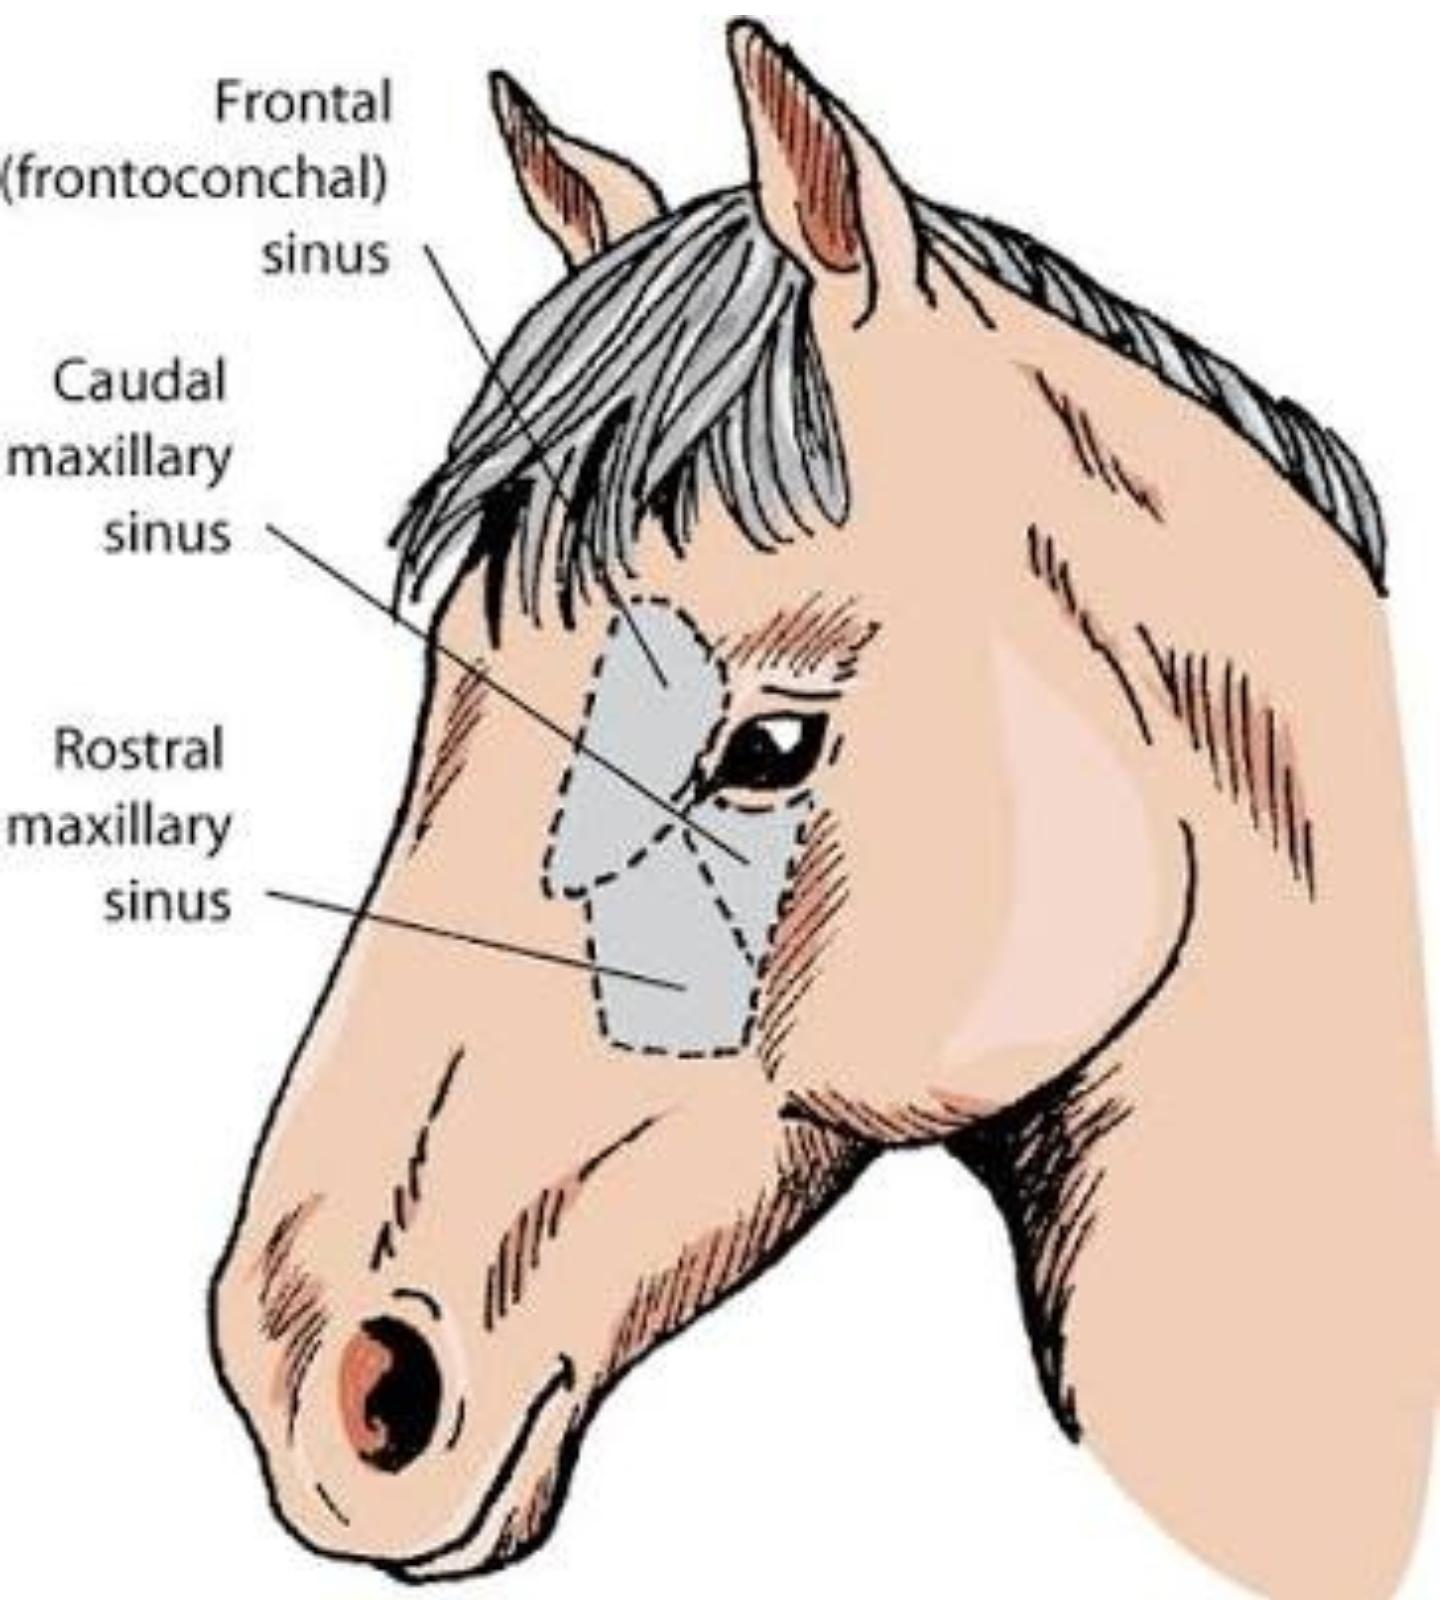 Maxillary Sinus Cyst Case photograph